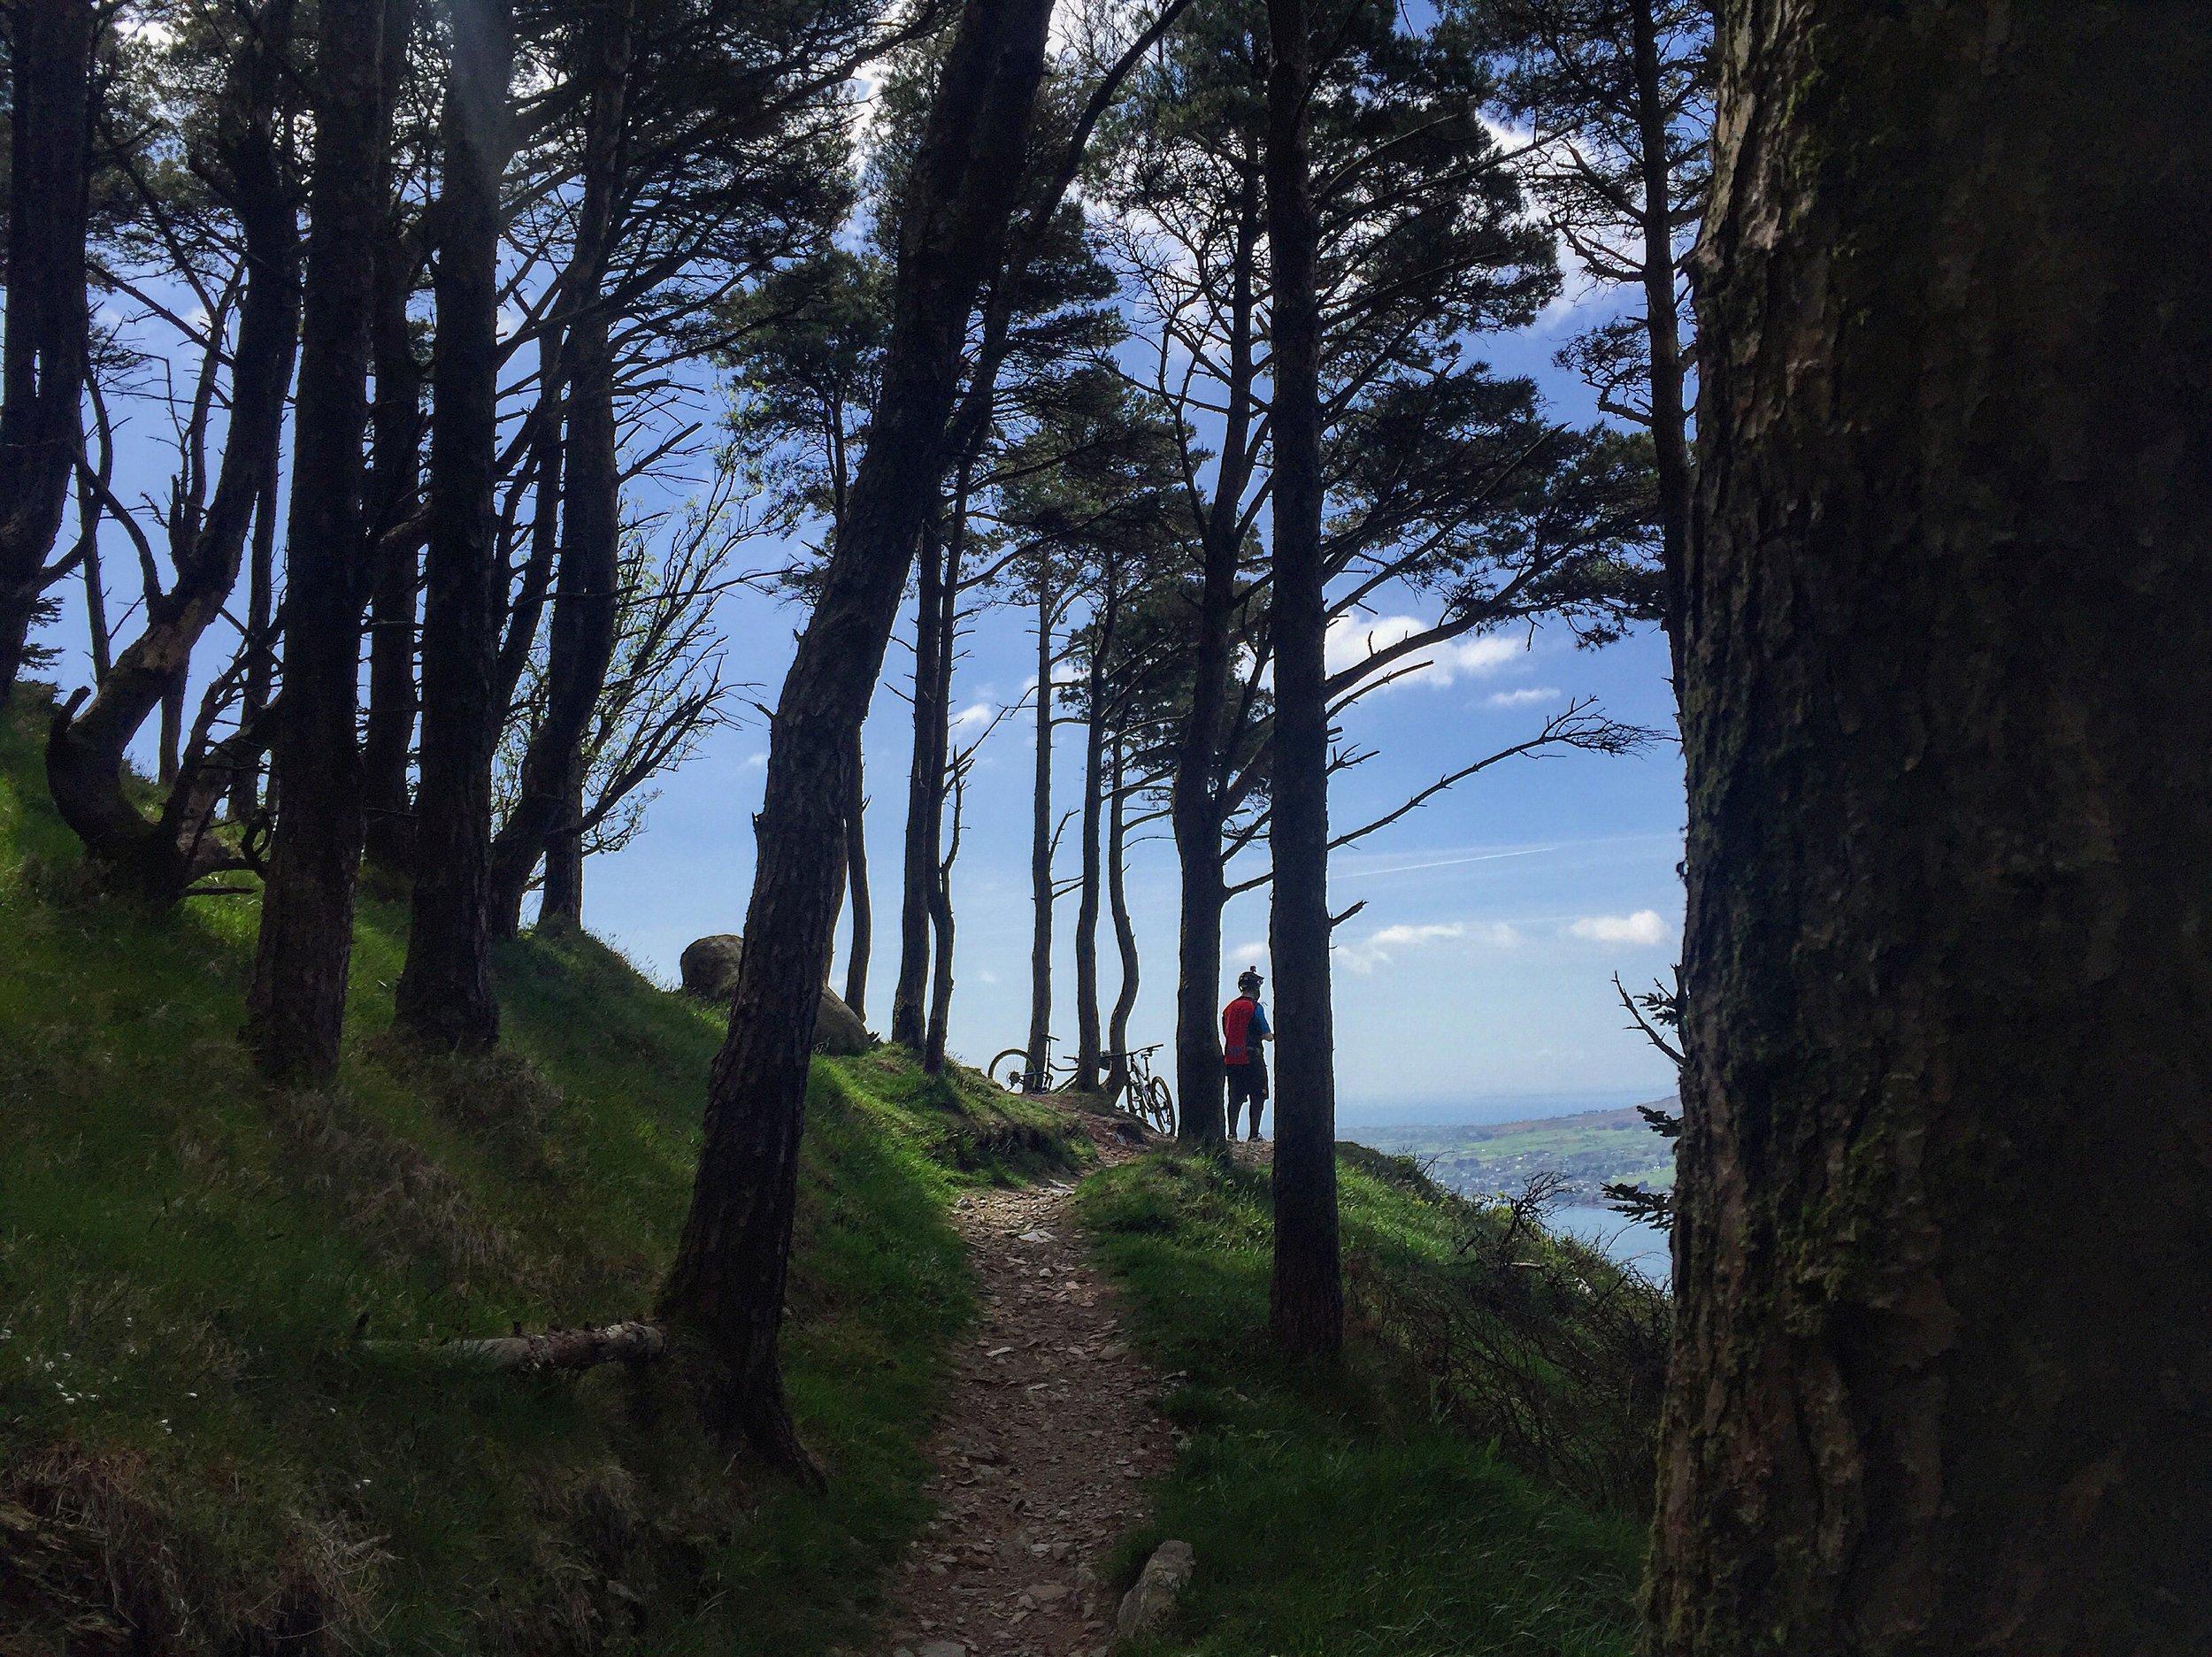 kodak_corner_kilbroney_forest_trails_rostrevor_mtb_mountainbiking_ni_explorer_niexplorer_northern_ireland_blog.jpg